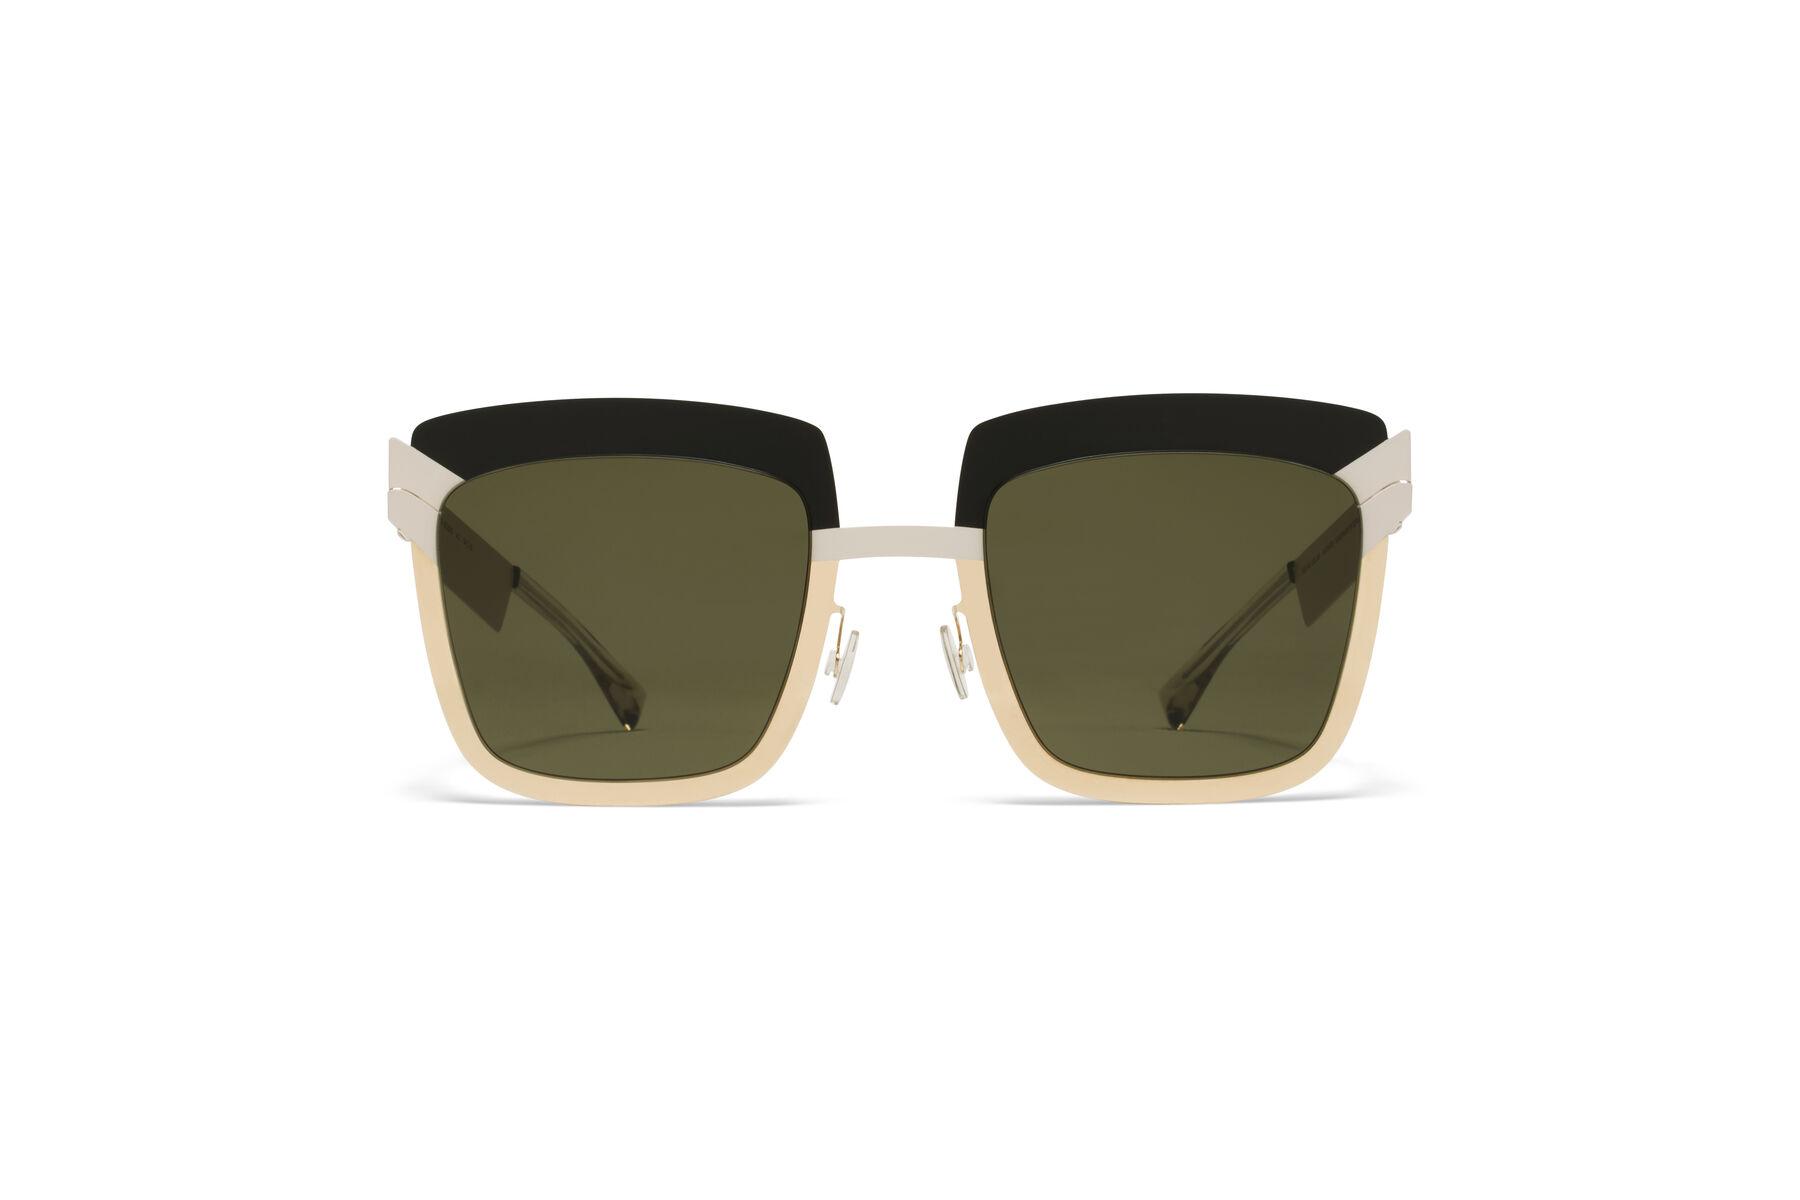 Studio 4.2 sunglasses - Black Mykita xHNrnwry